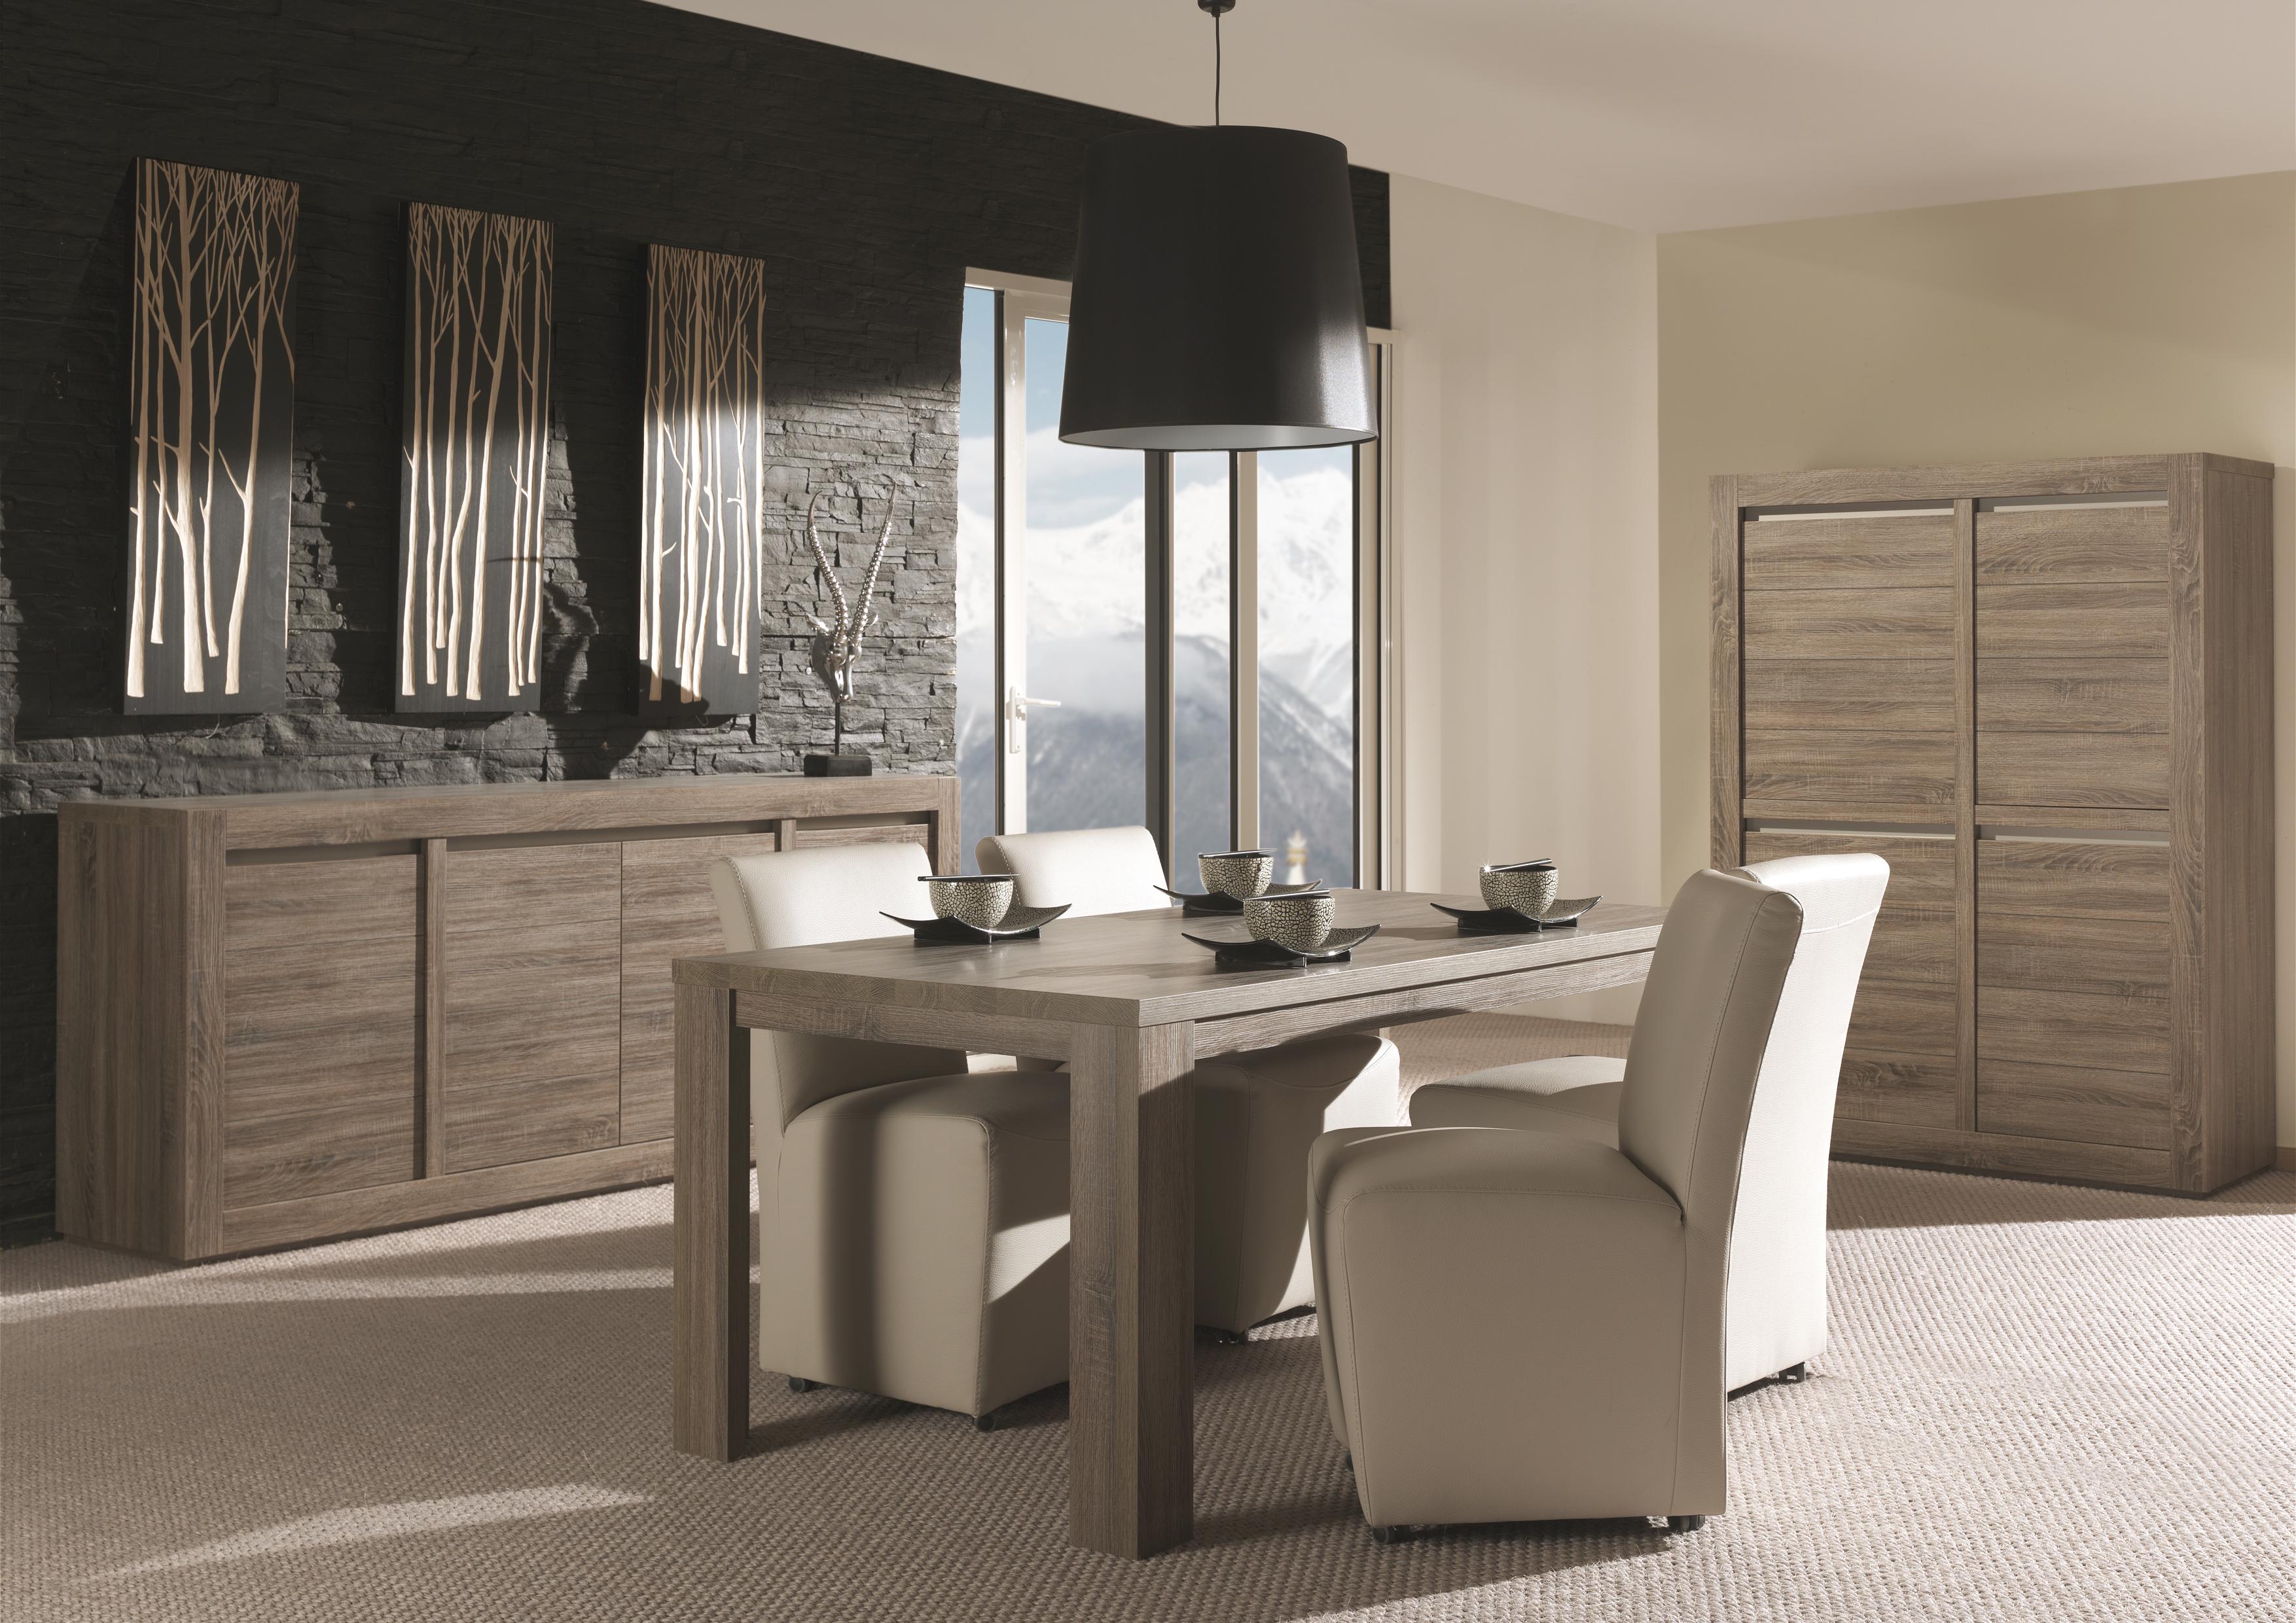 Eetkamer raffia meubelen tilt de keizer - Moderne eetkamer en woonkamer ...